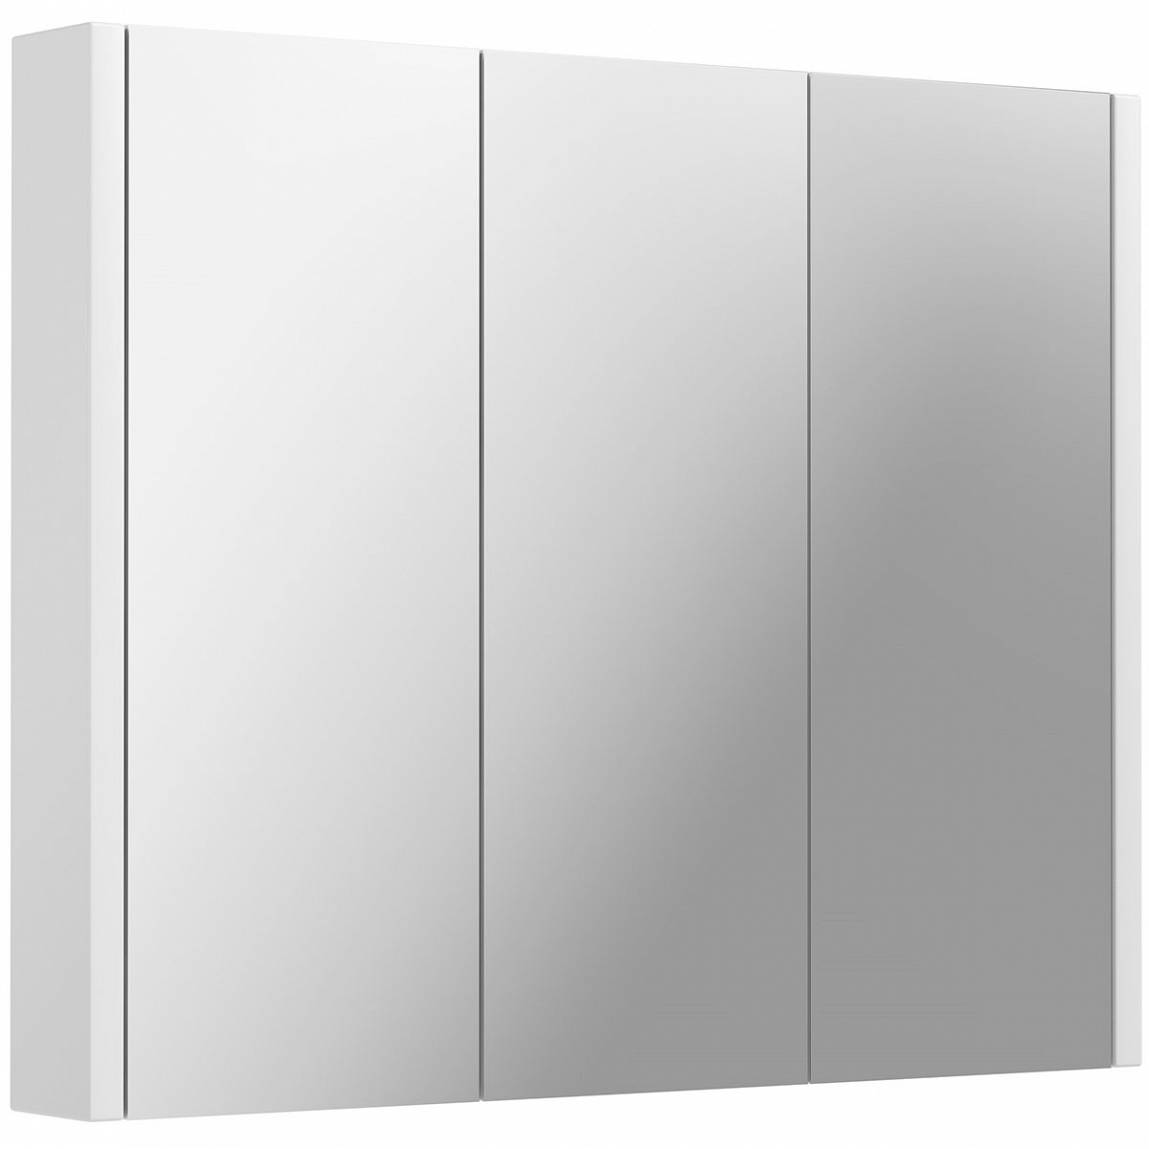 Image of Odessa White 3 Door Mirror Cabinet